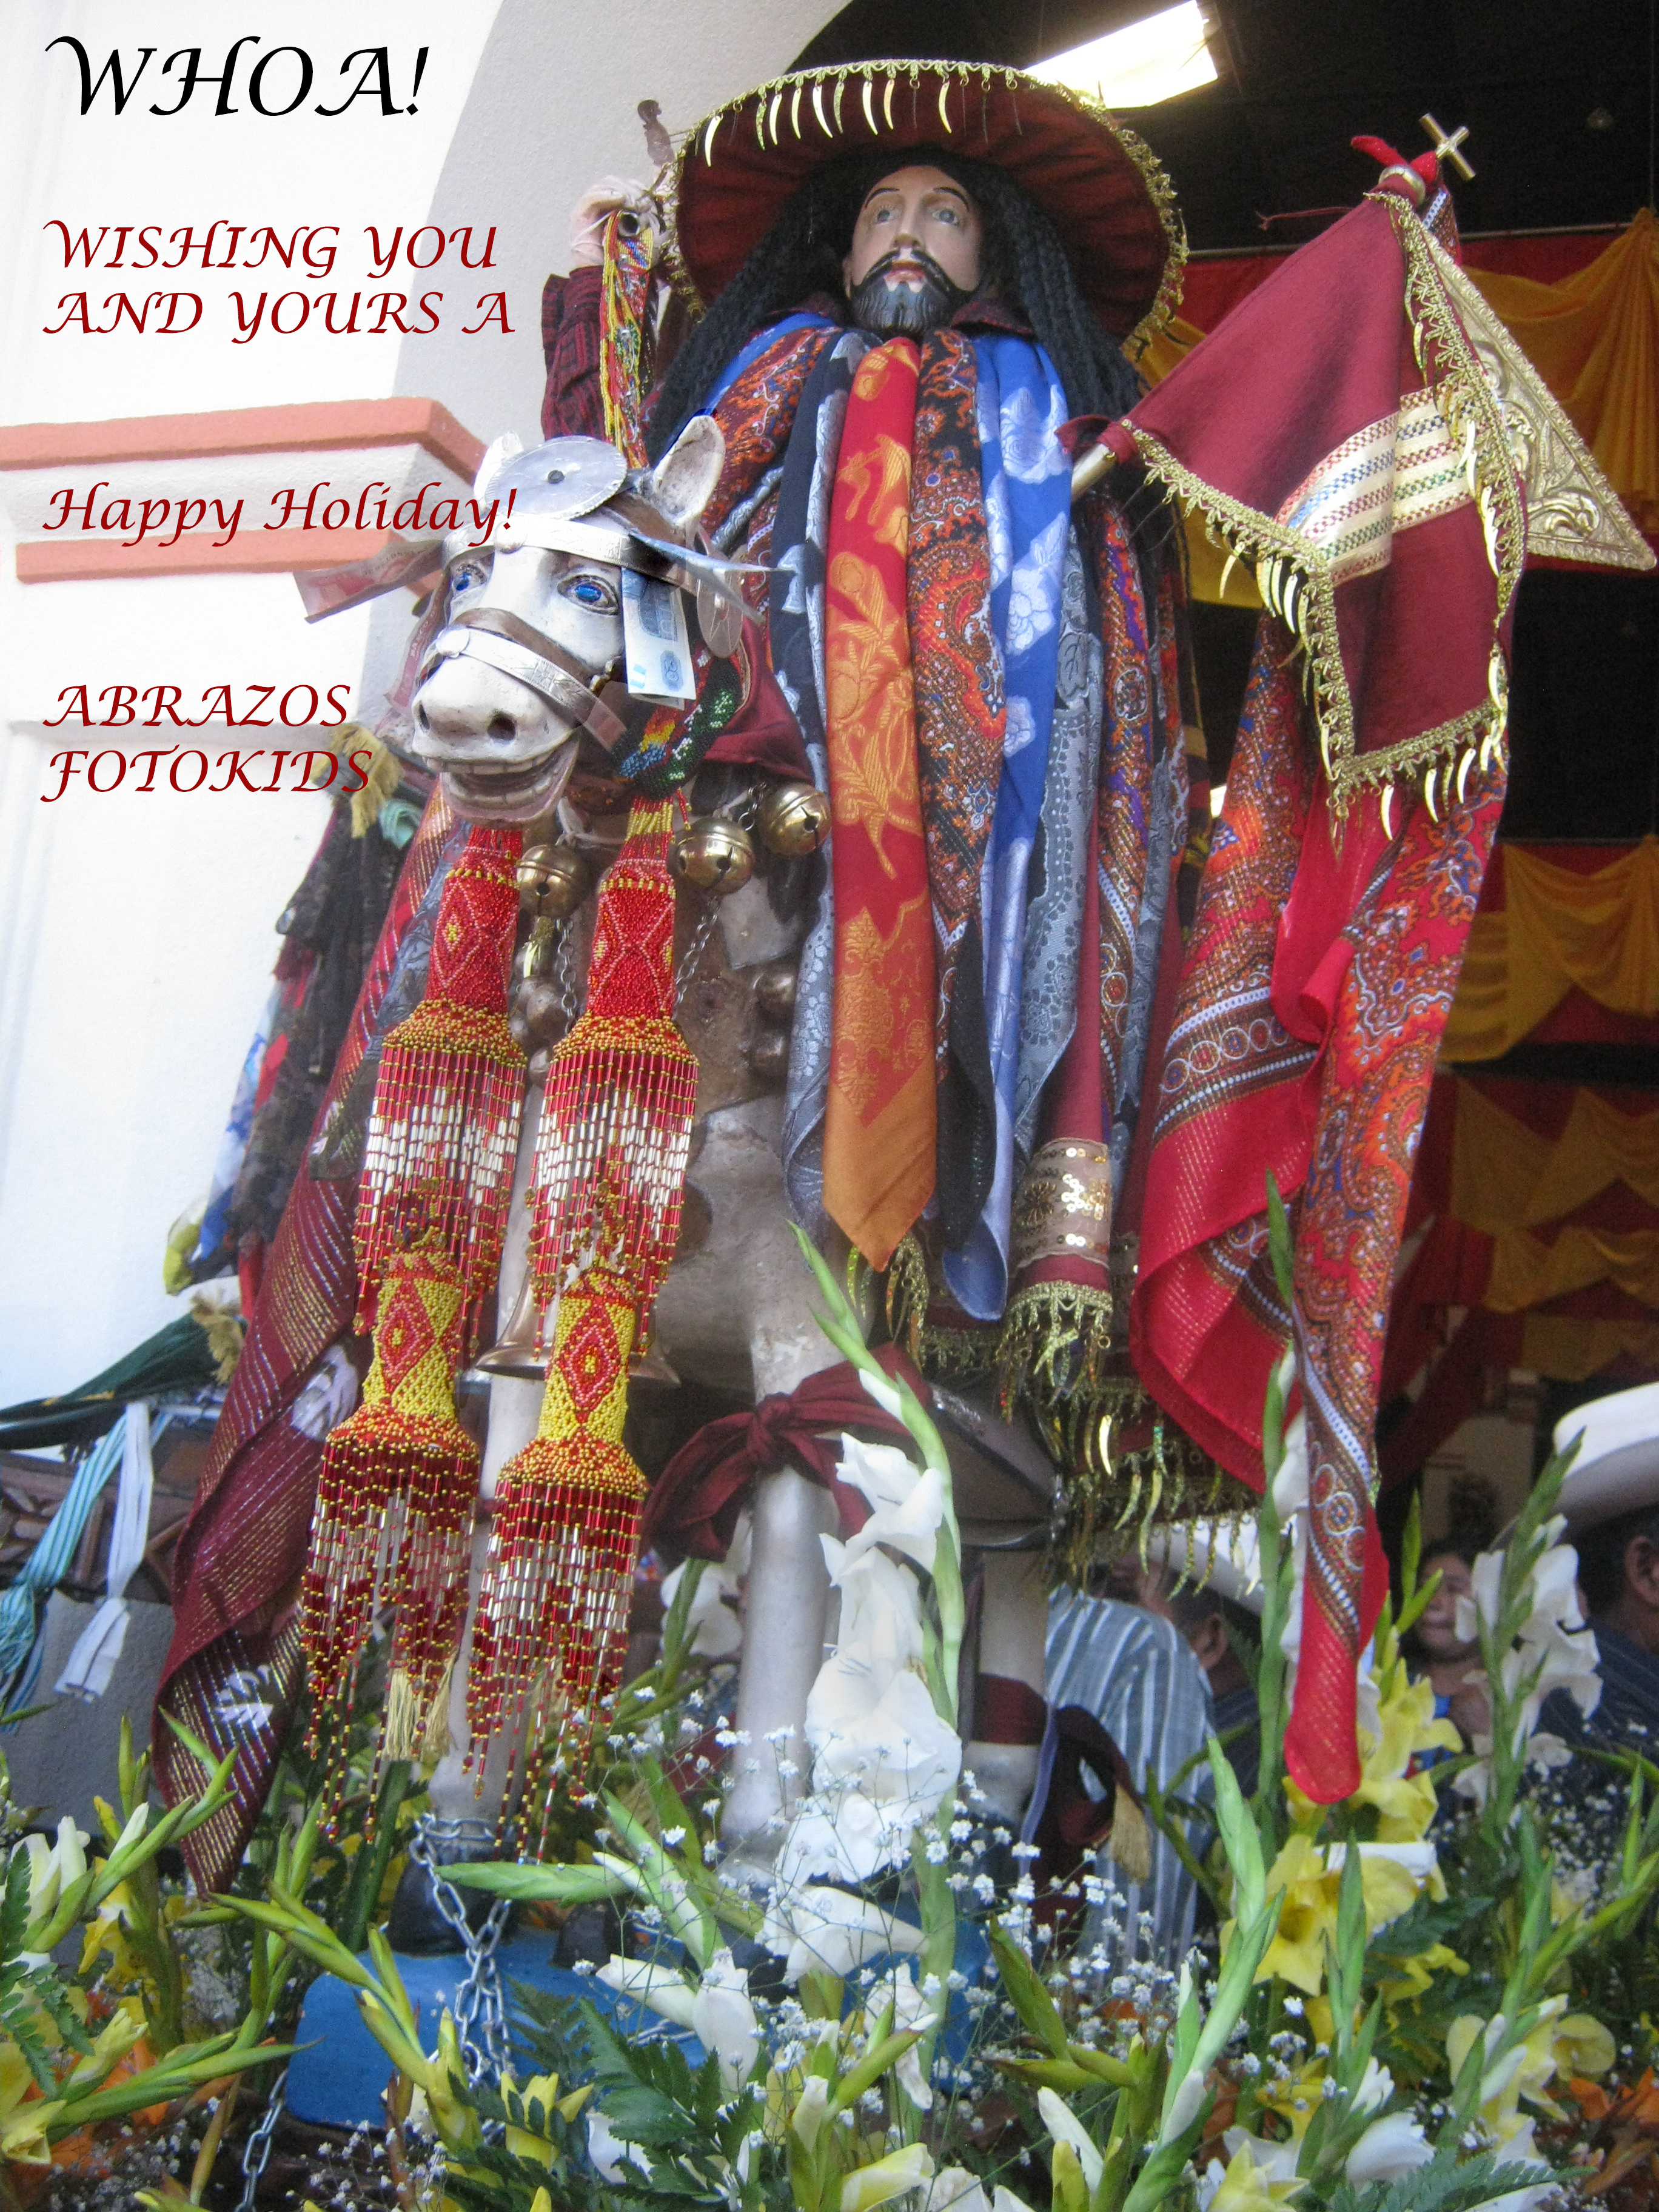 fotokids insider   Insider News of Fotokids Guatemala